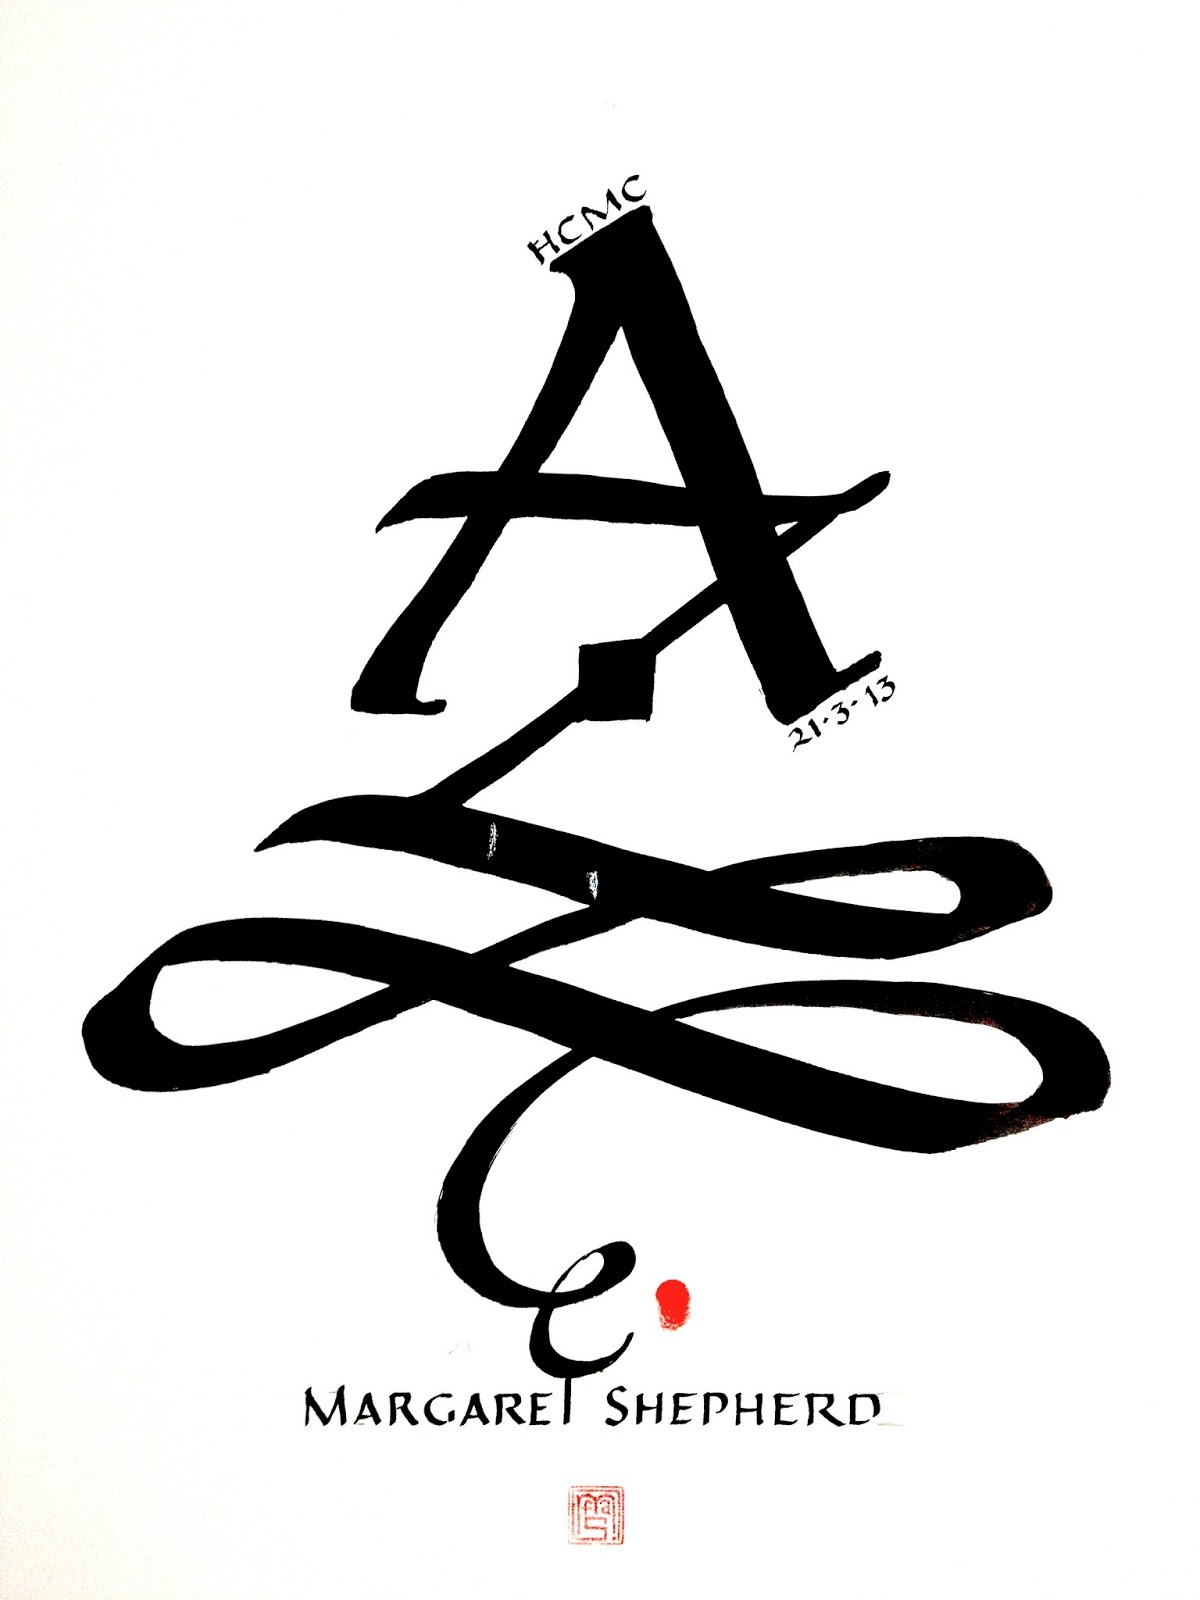 Margaret Shepherd Calligraphy Blog Alphabet Design Project